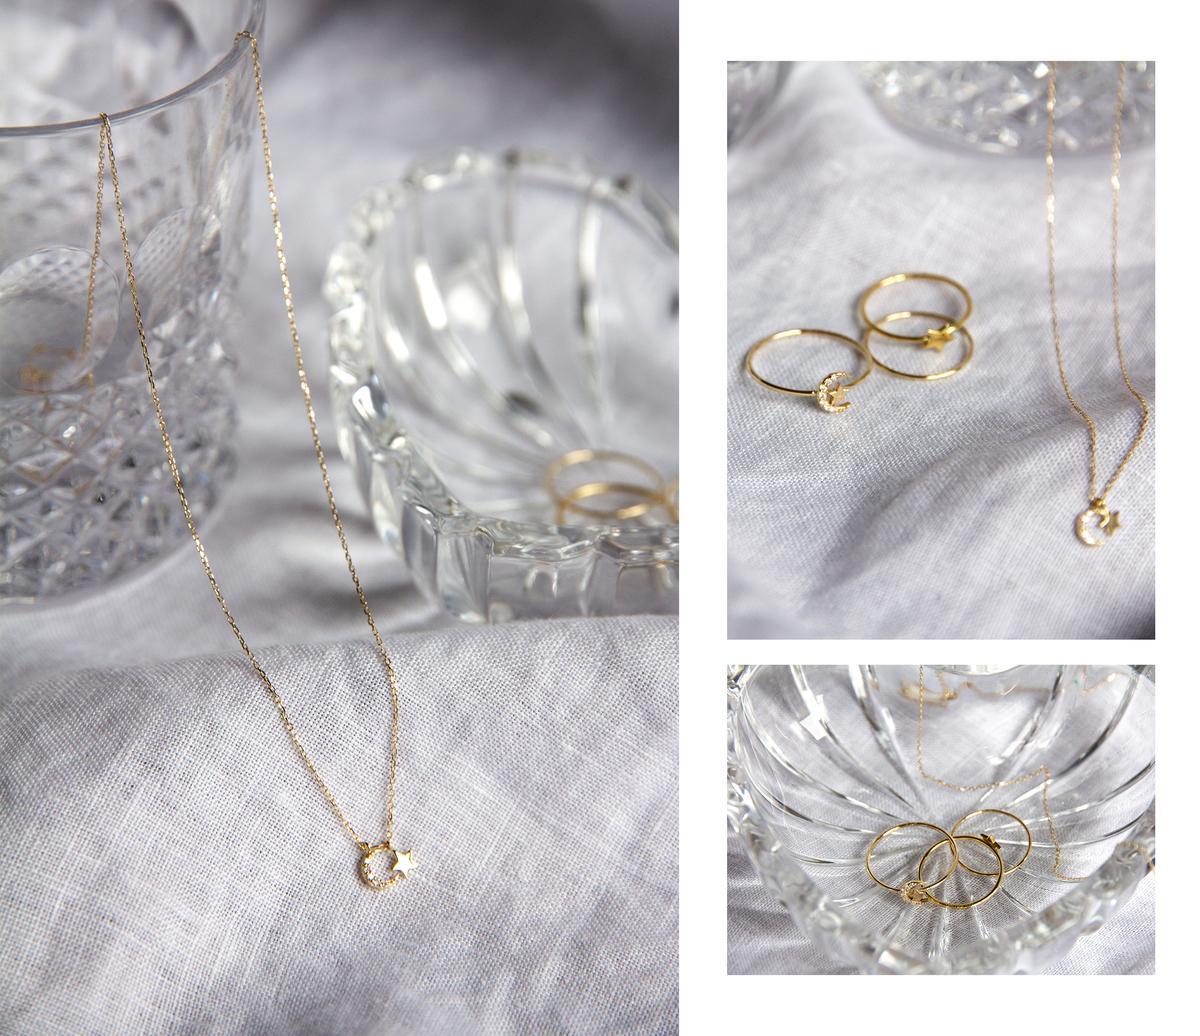 "<h5><em>By Charlotte<a href=""https://bycharlotte.com.au/products/14k-gold-evening-sky-necklace"" target=""_blank"">14K Gold Diamond Evening Sky Necklace</a> ($469),<a..."